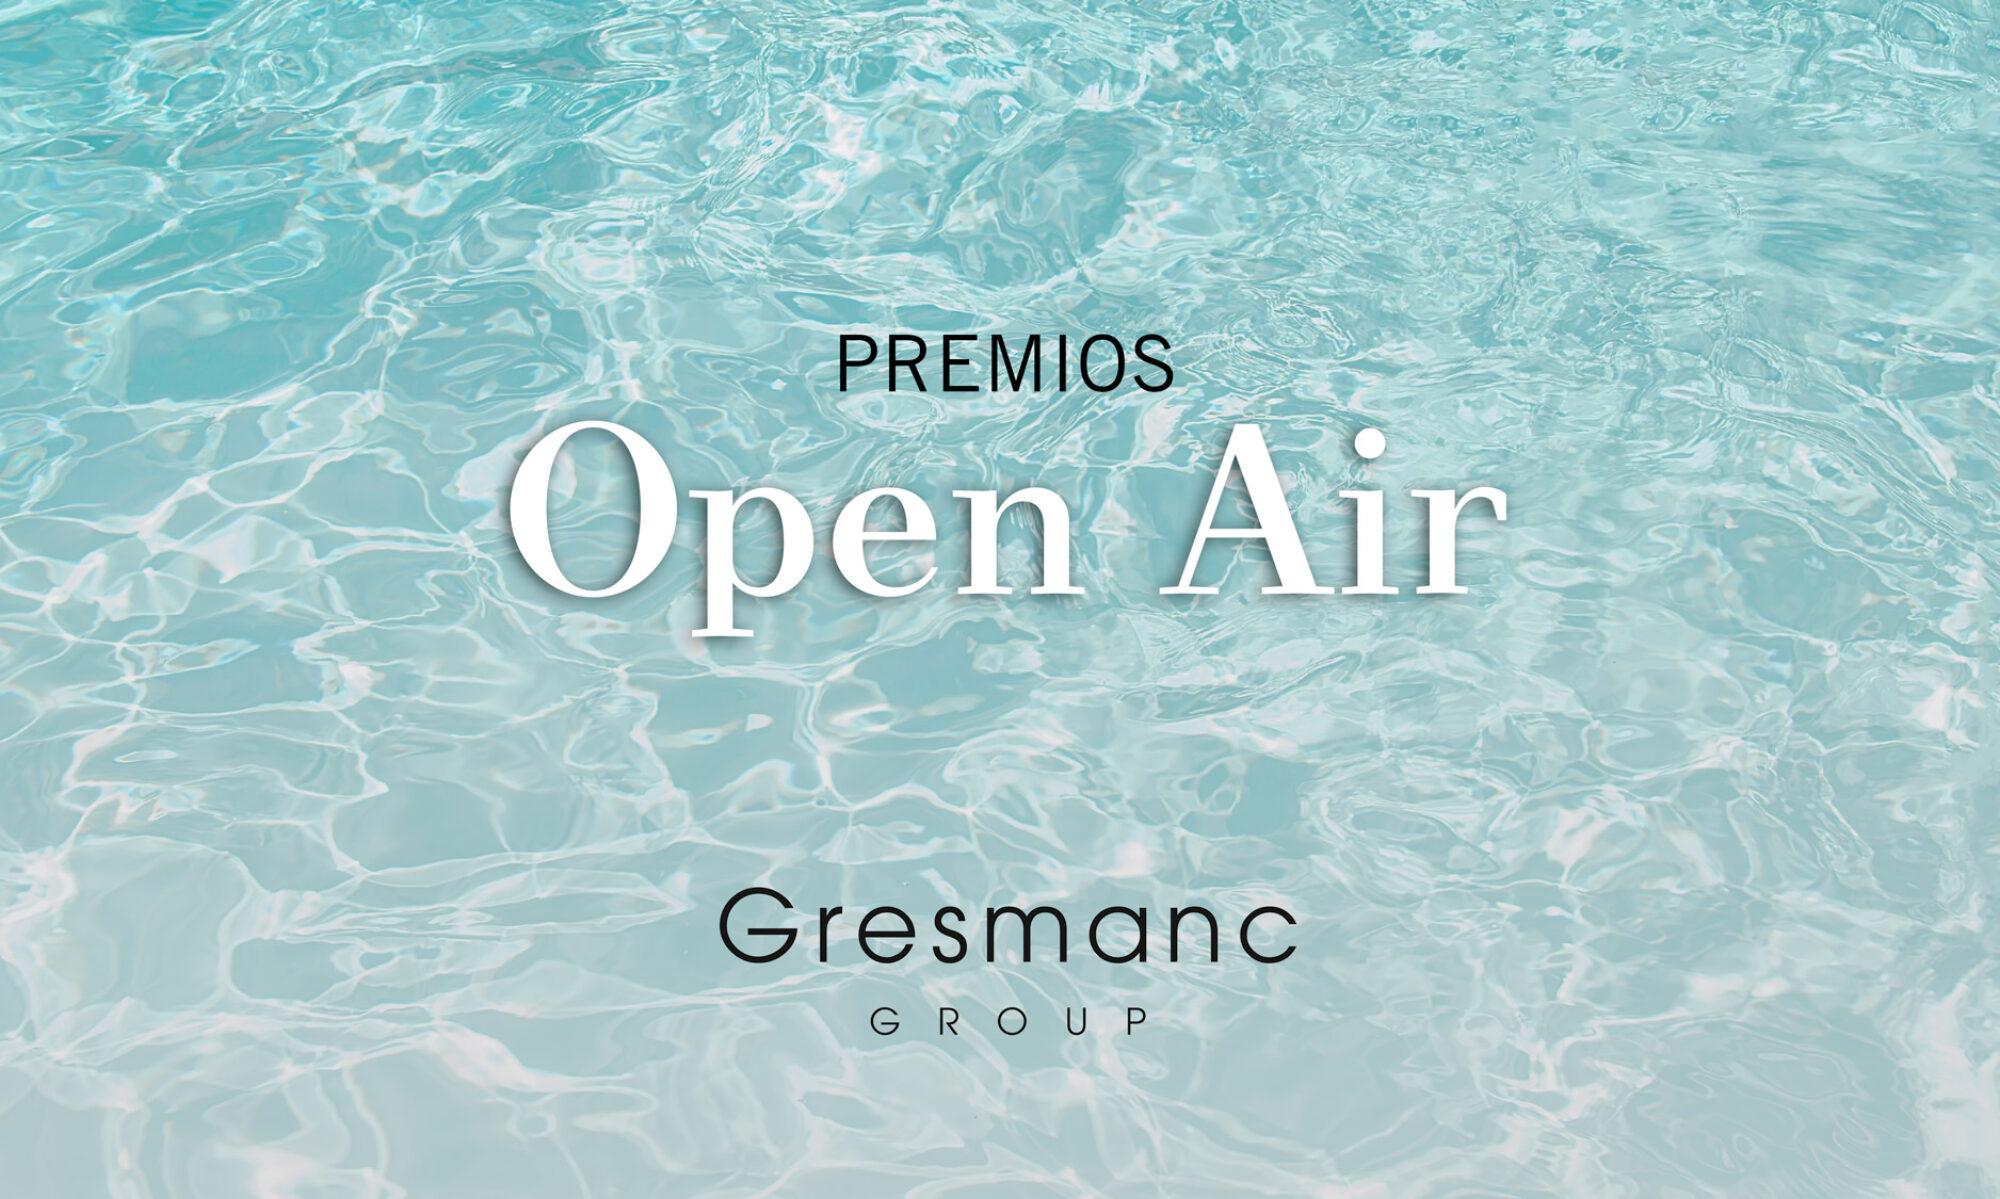 Premios Open Air